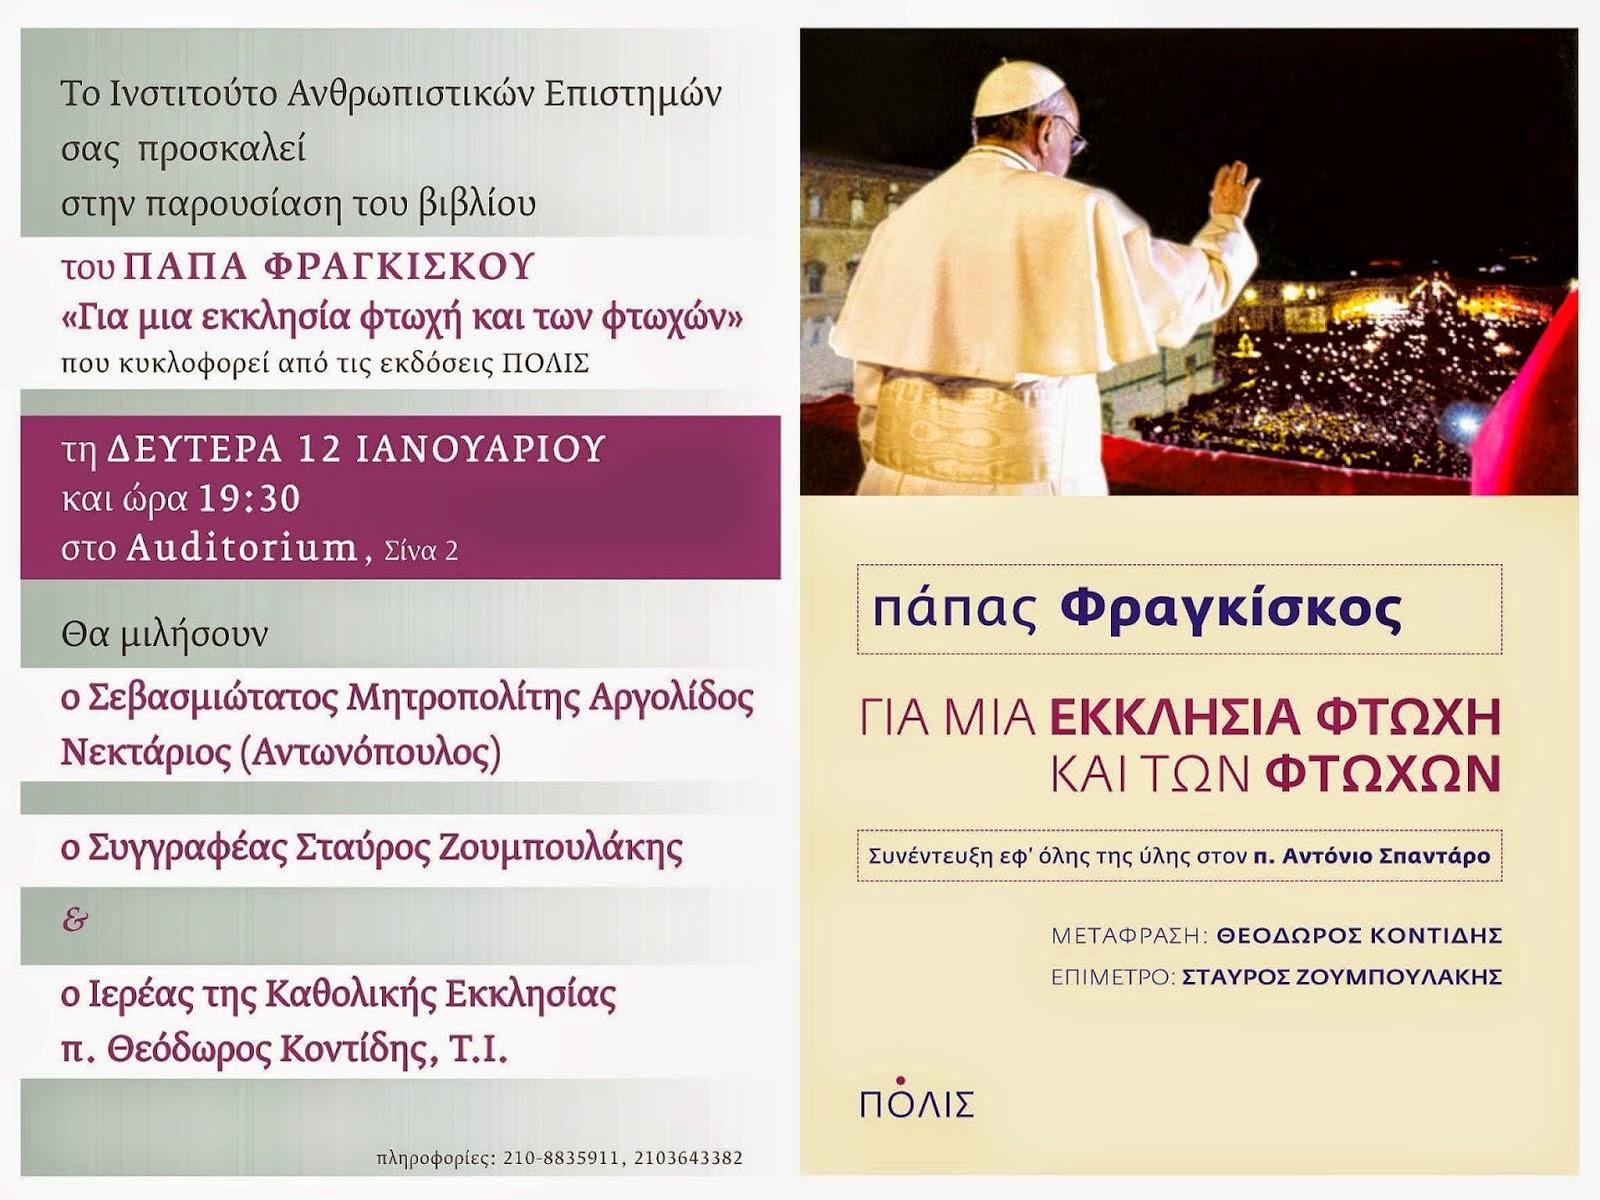 http://www.pentapostagma.gr/wp-content/uploads/2015/01/Prosklisi-Papas.jpg